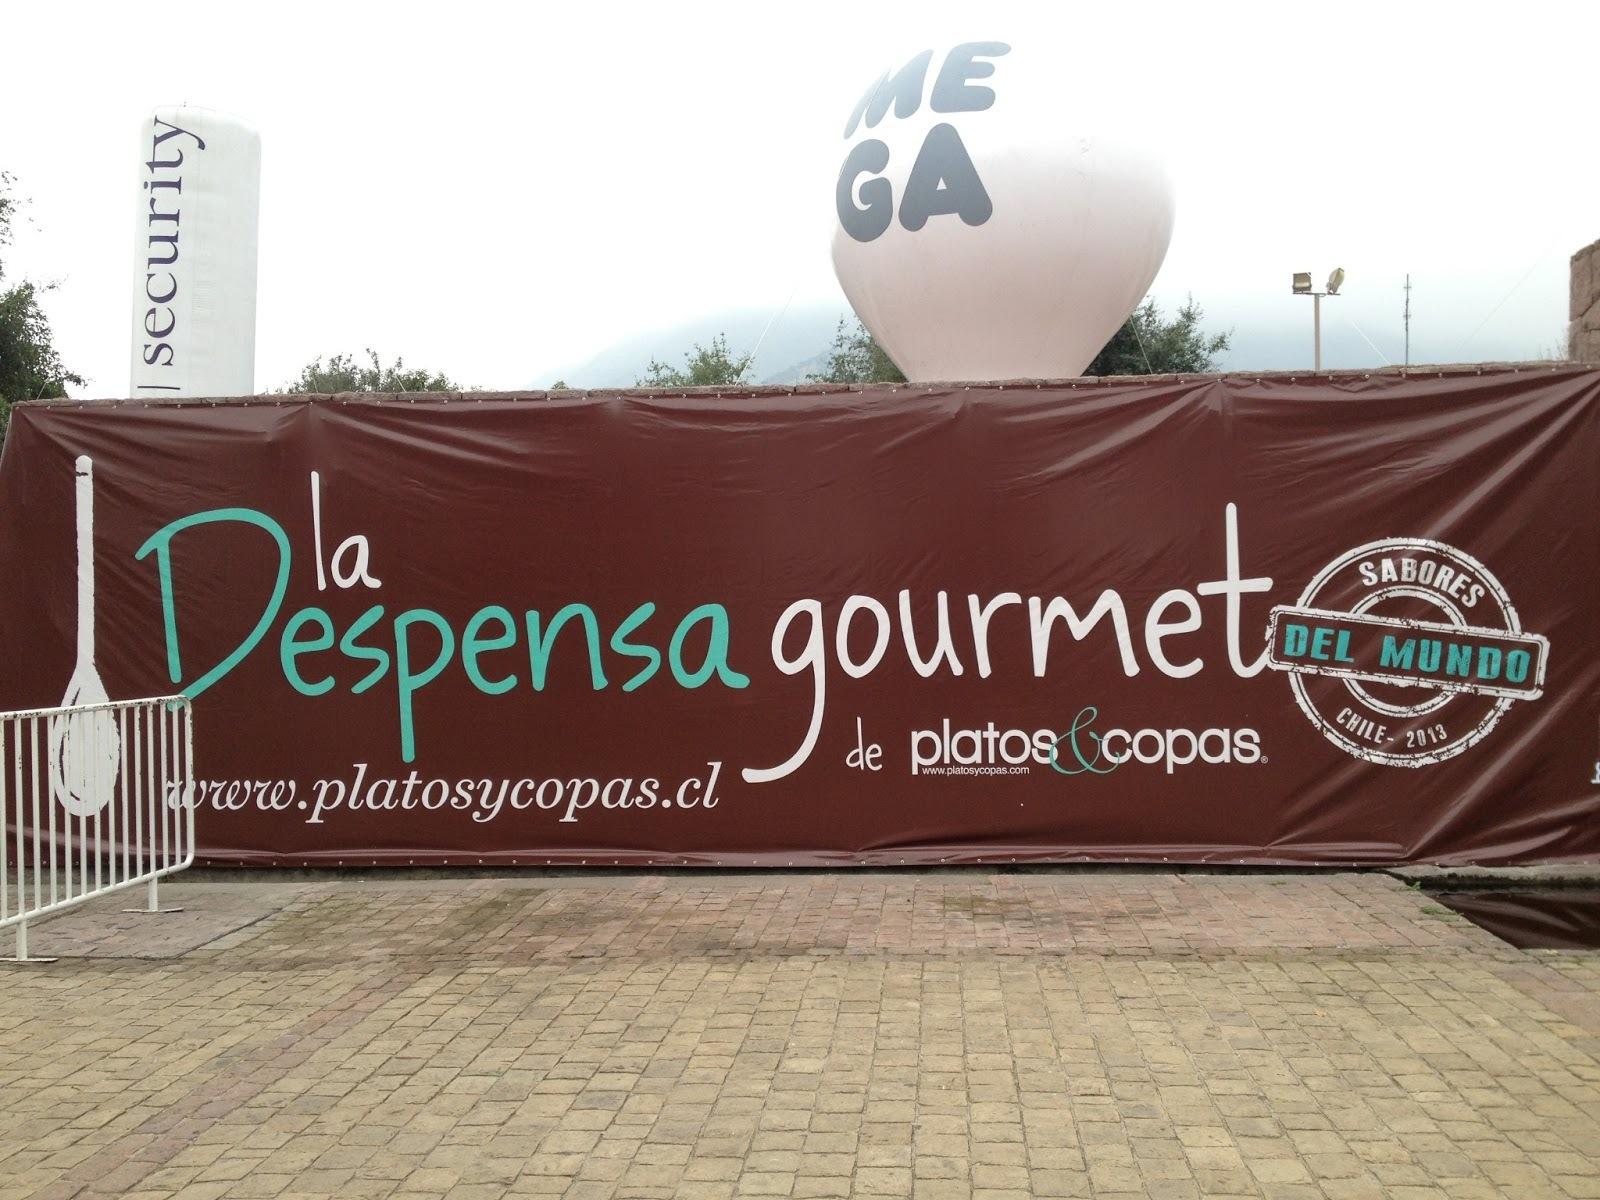 La despensa gourmet: Feria gastronomica